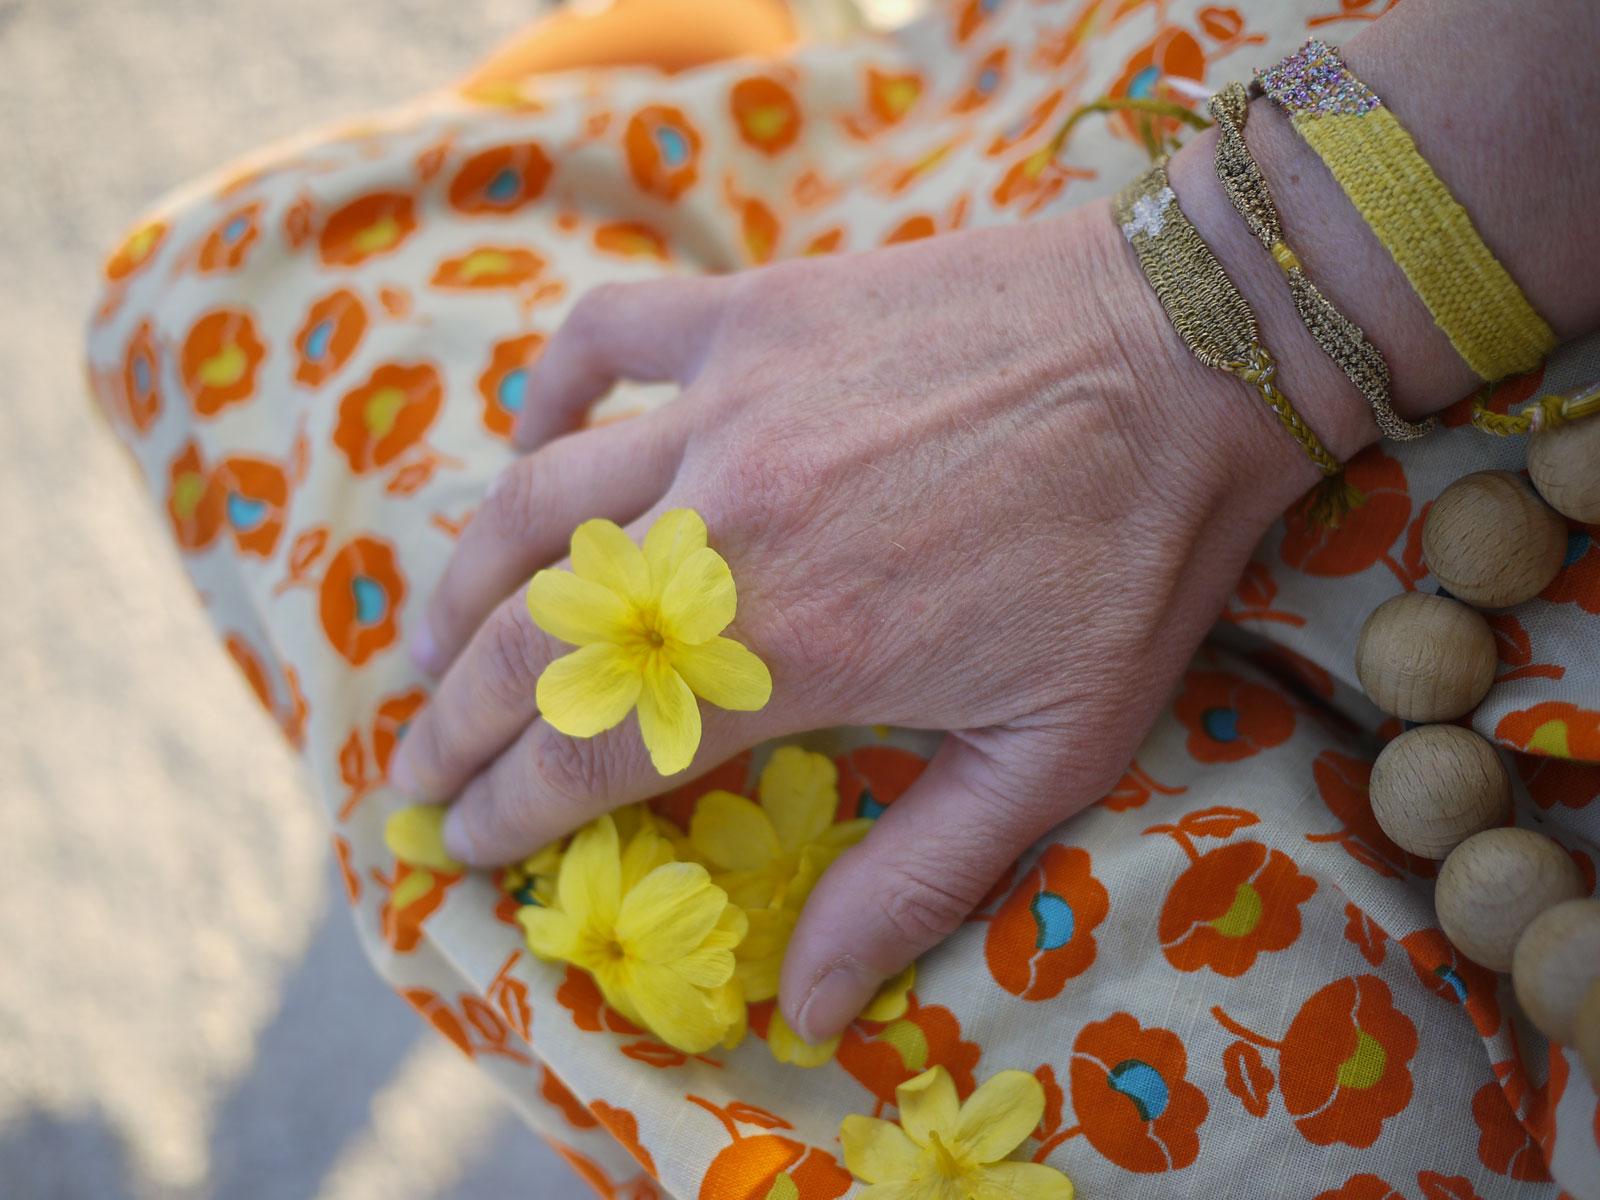 Bracelets LOOM - Design textile by Myriam Balaÿ myriam-balay-jardin1 CUEILLETTE du JARDIN L'appartement